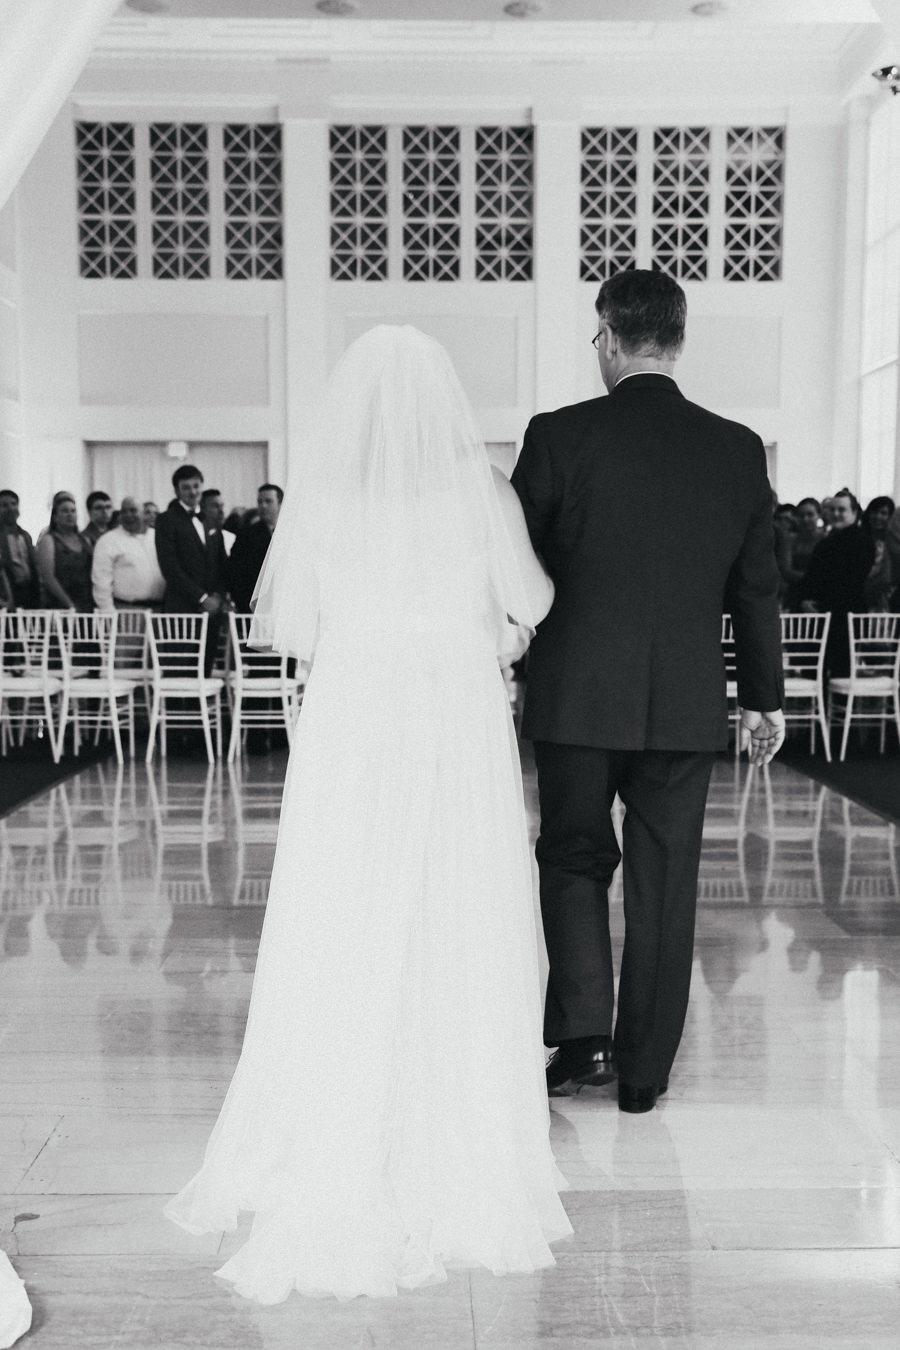 Wedding Ceremony Portrait with Traditional Veil